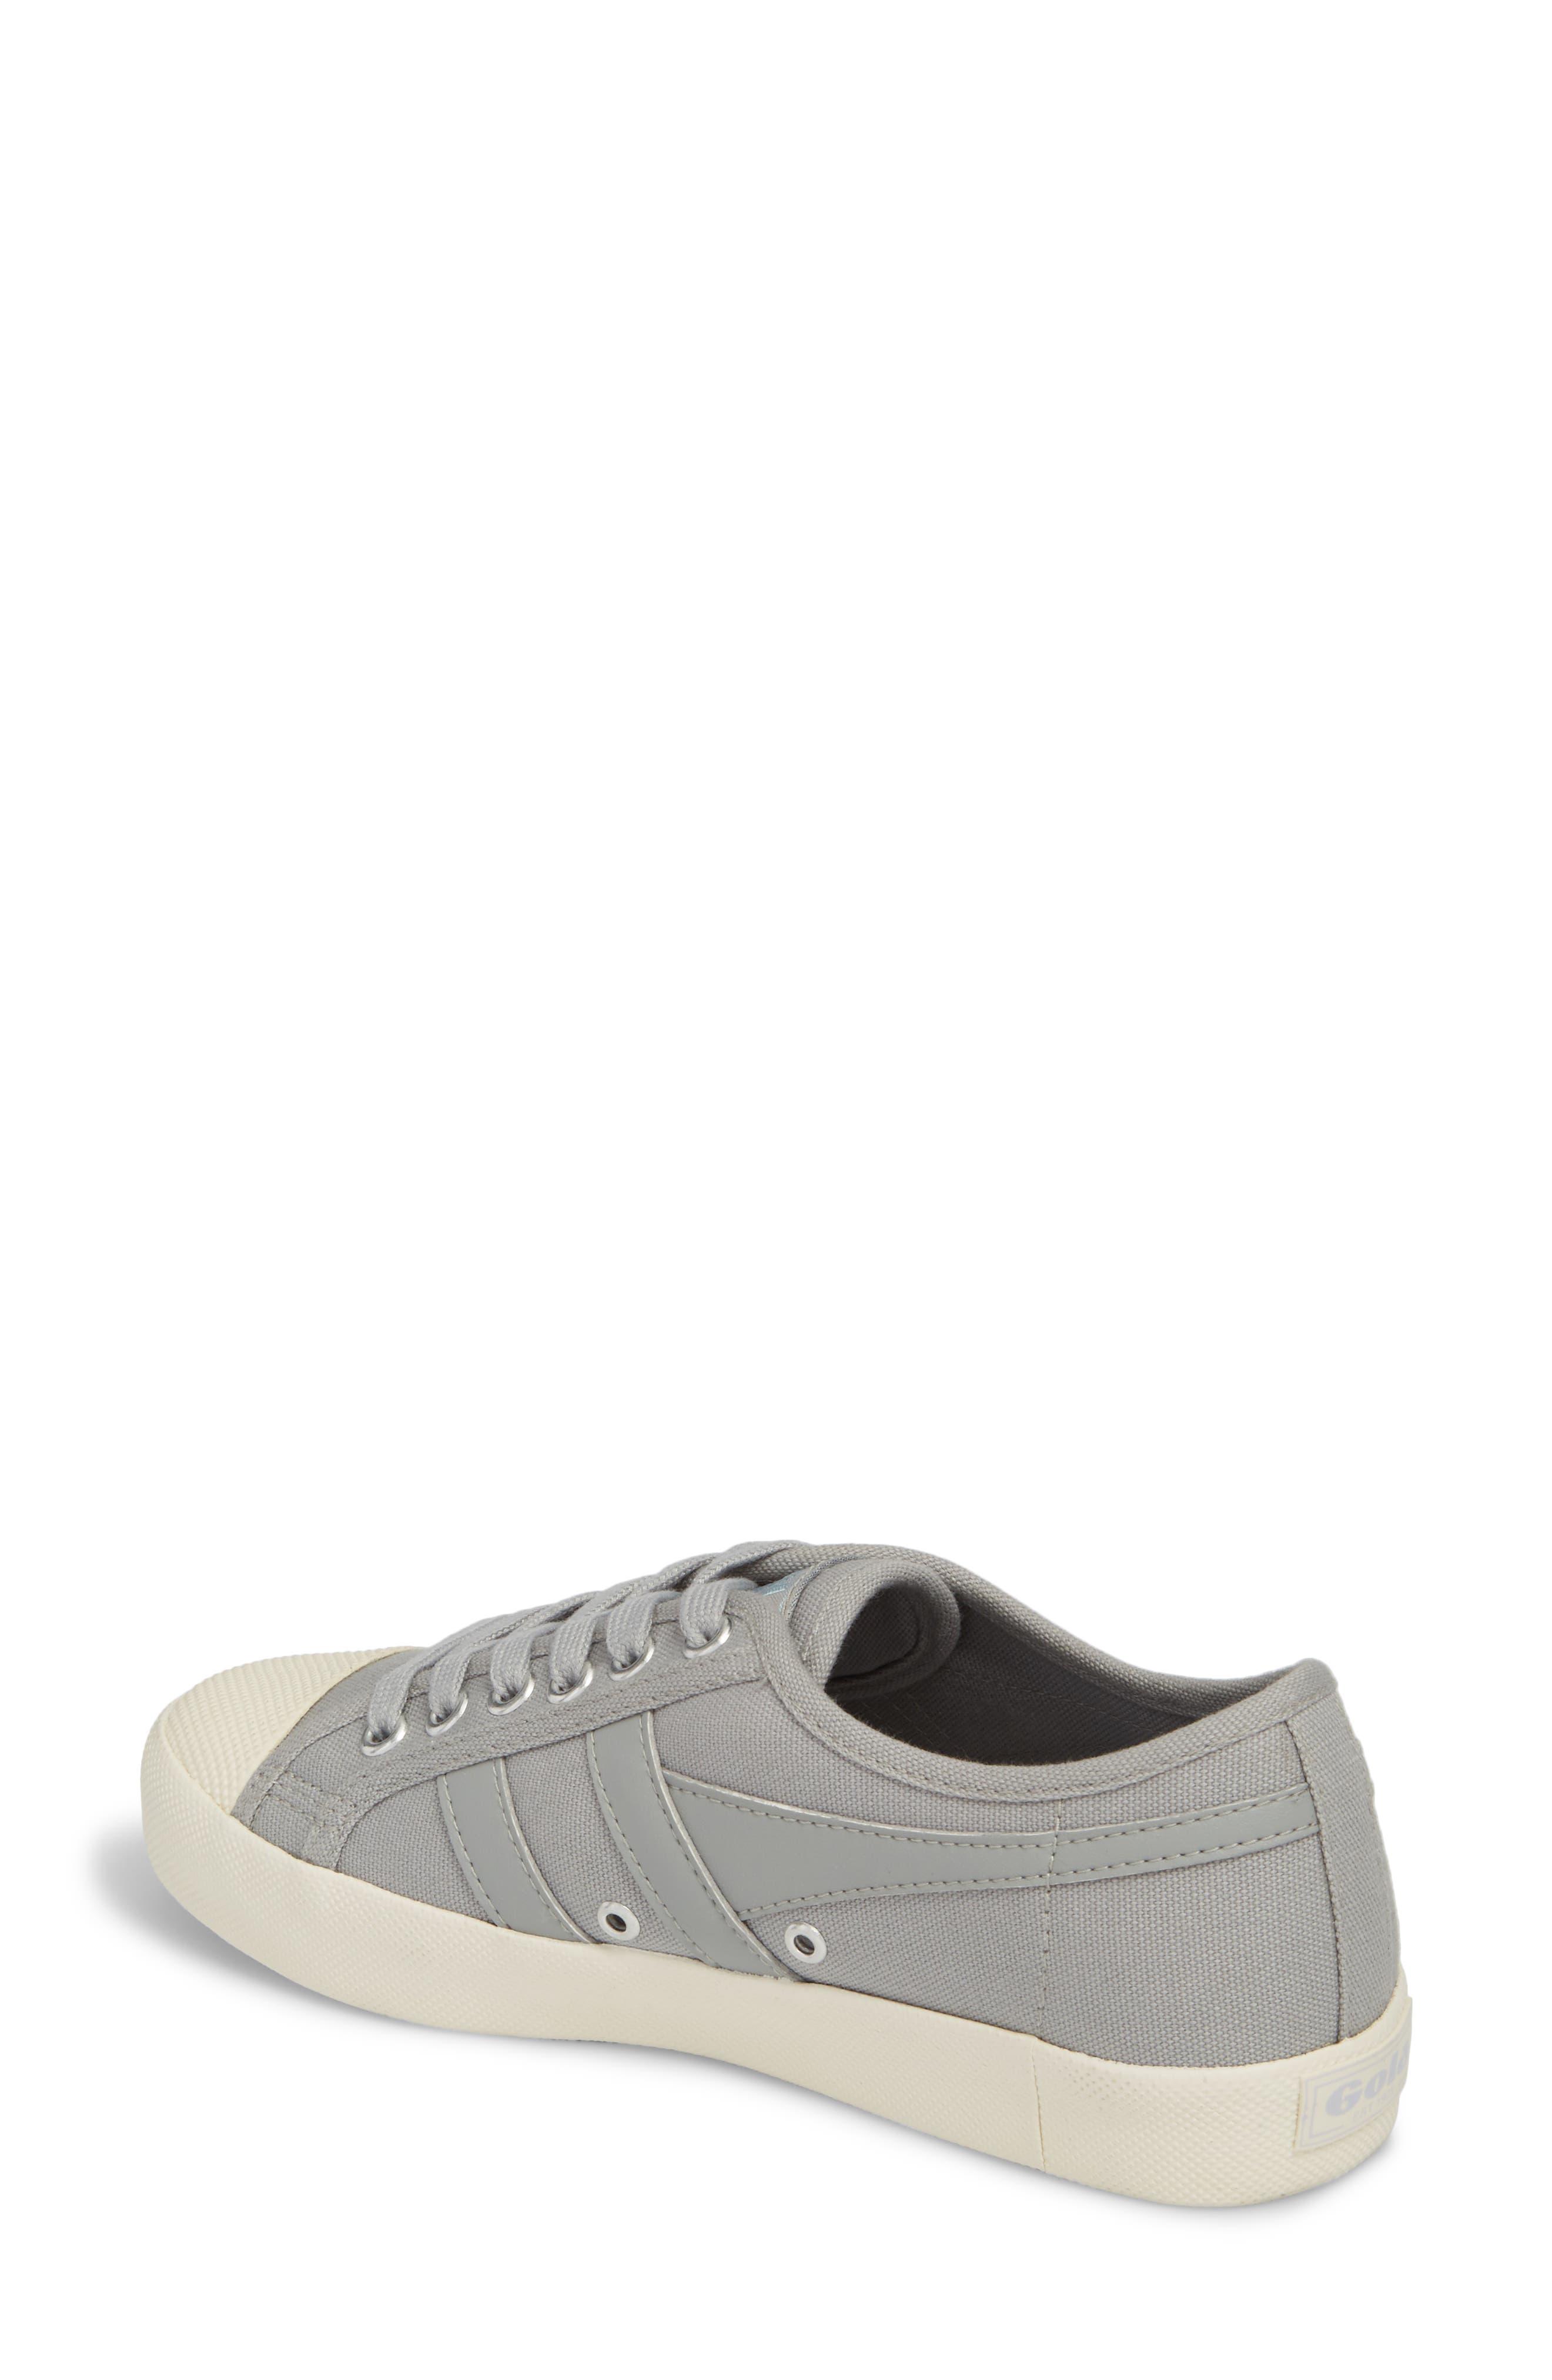 Coaster Sneaker,                             Alternate thumbnail 2, color,                             Paloma/ Off White